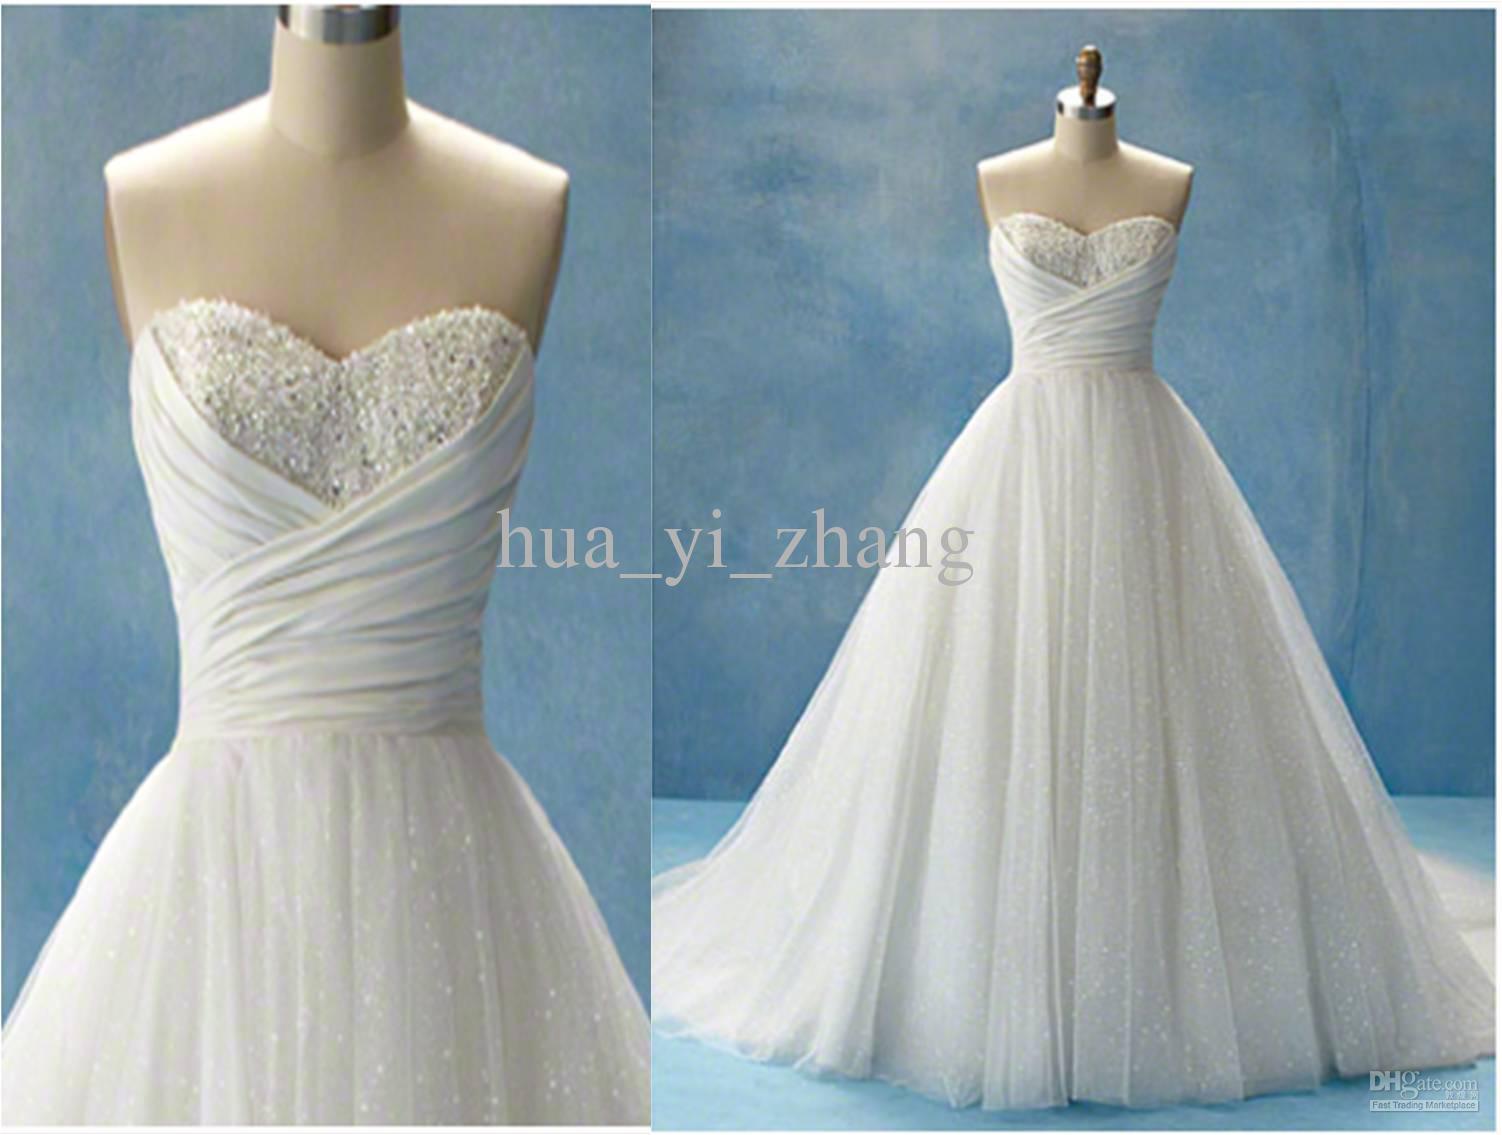 Big Puffy Wedding Dresses Bling | Dress images